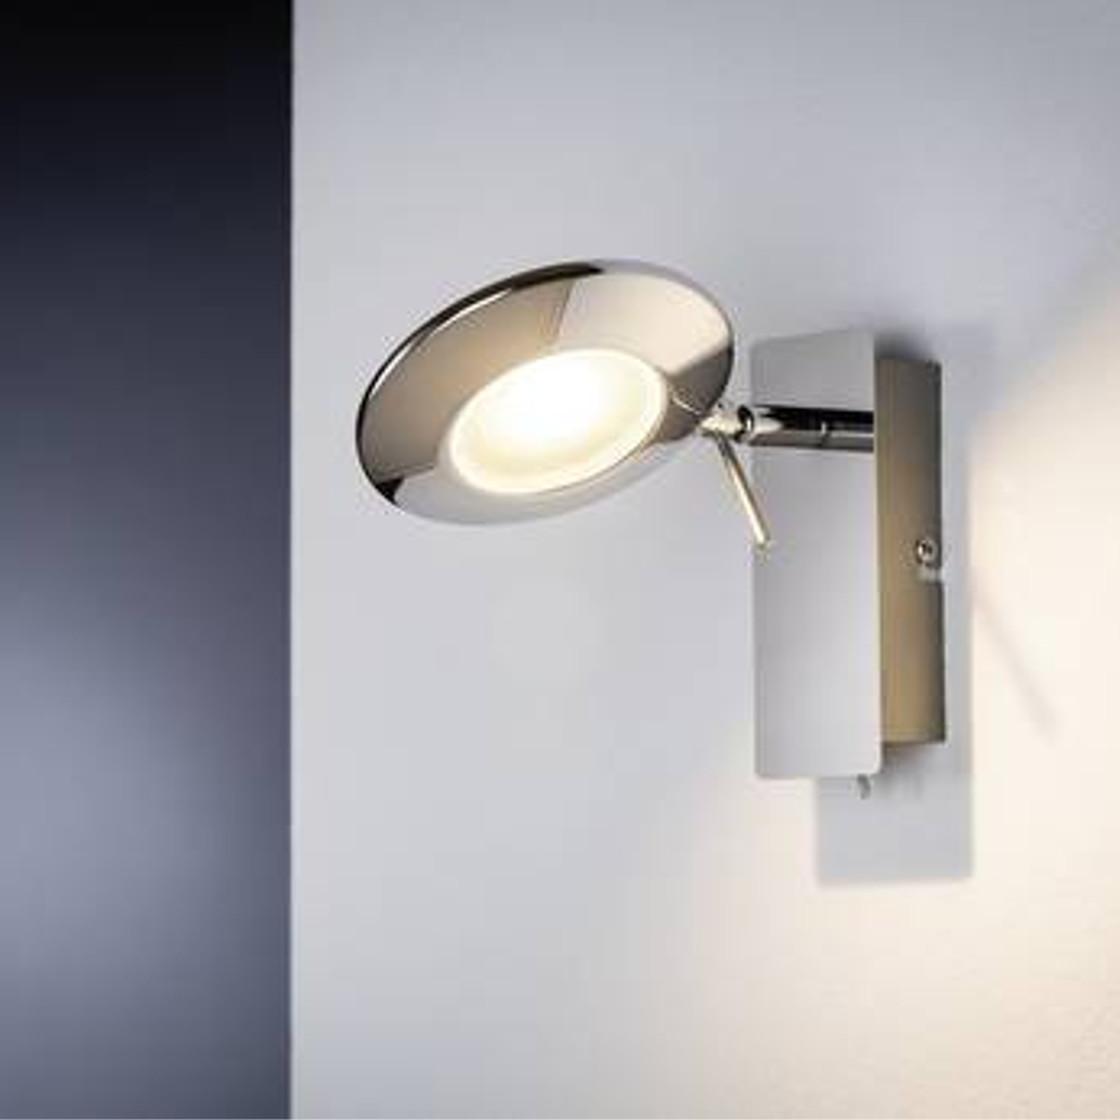 paulmann orb strahler led 2x3w weiss inkl leuchtmittel lamp 48 99. Black Bedroom Furniture Sets. Home Design Ideas